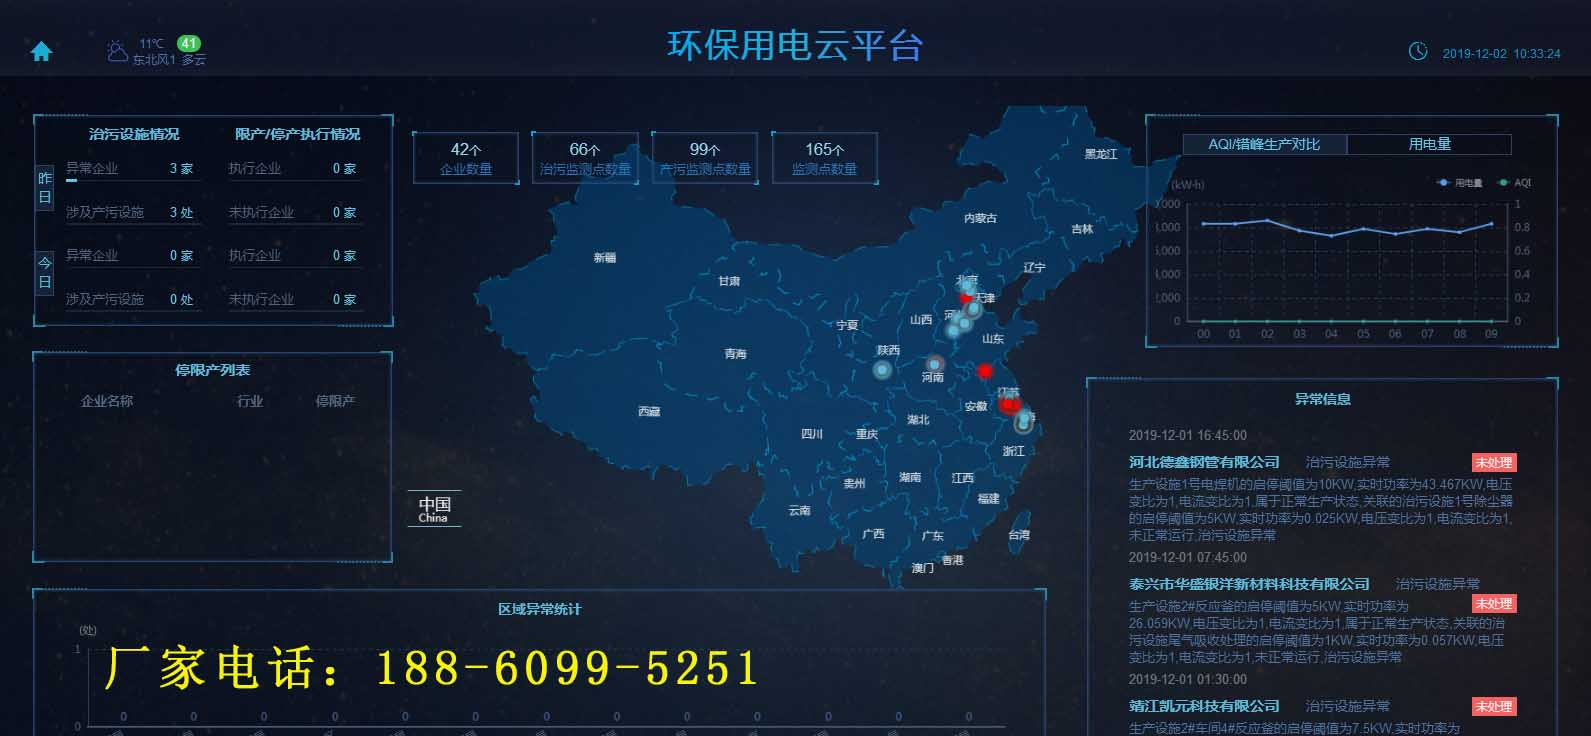 http://www.hjw123.com/lvsenenyuan/58750.html